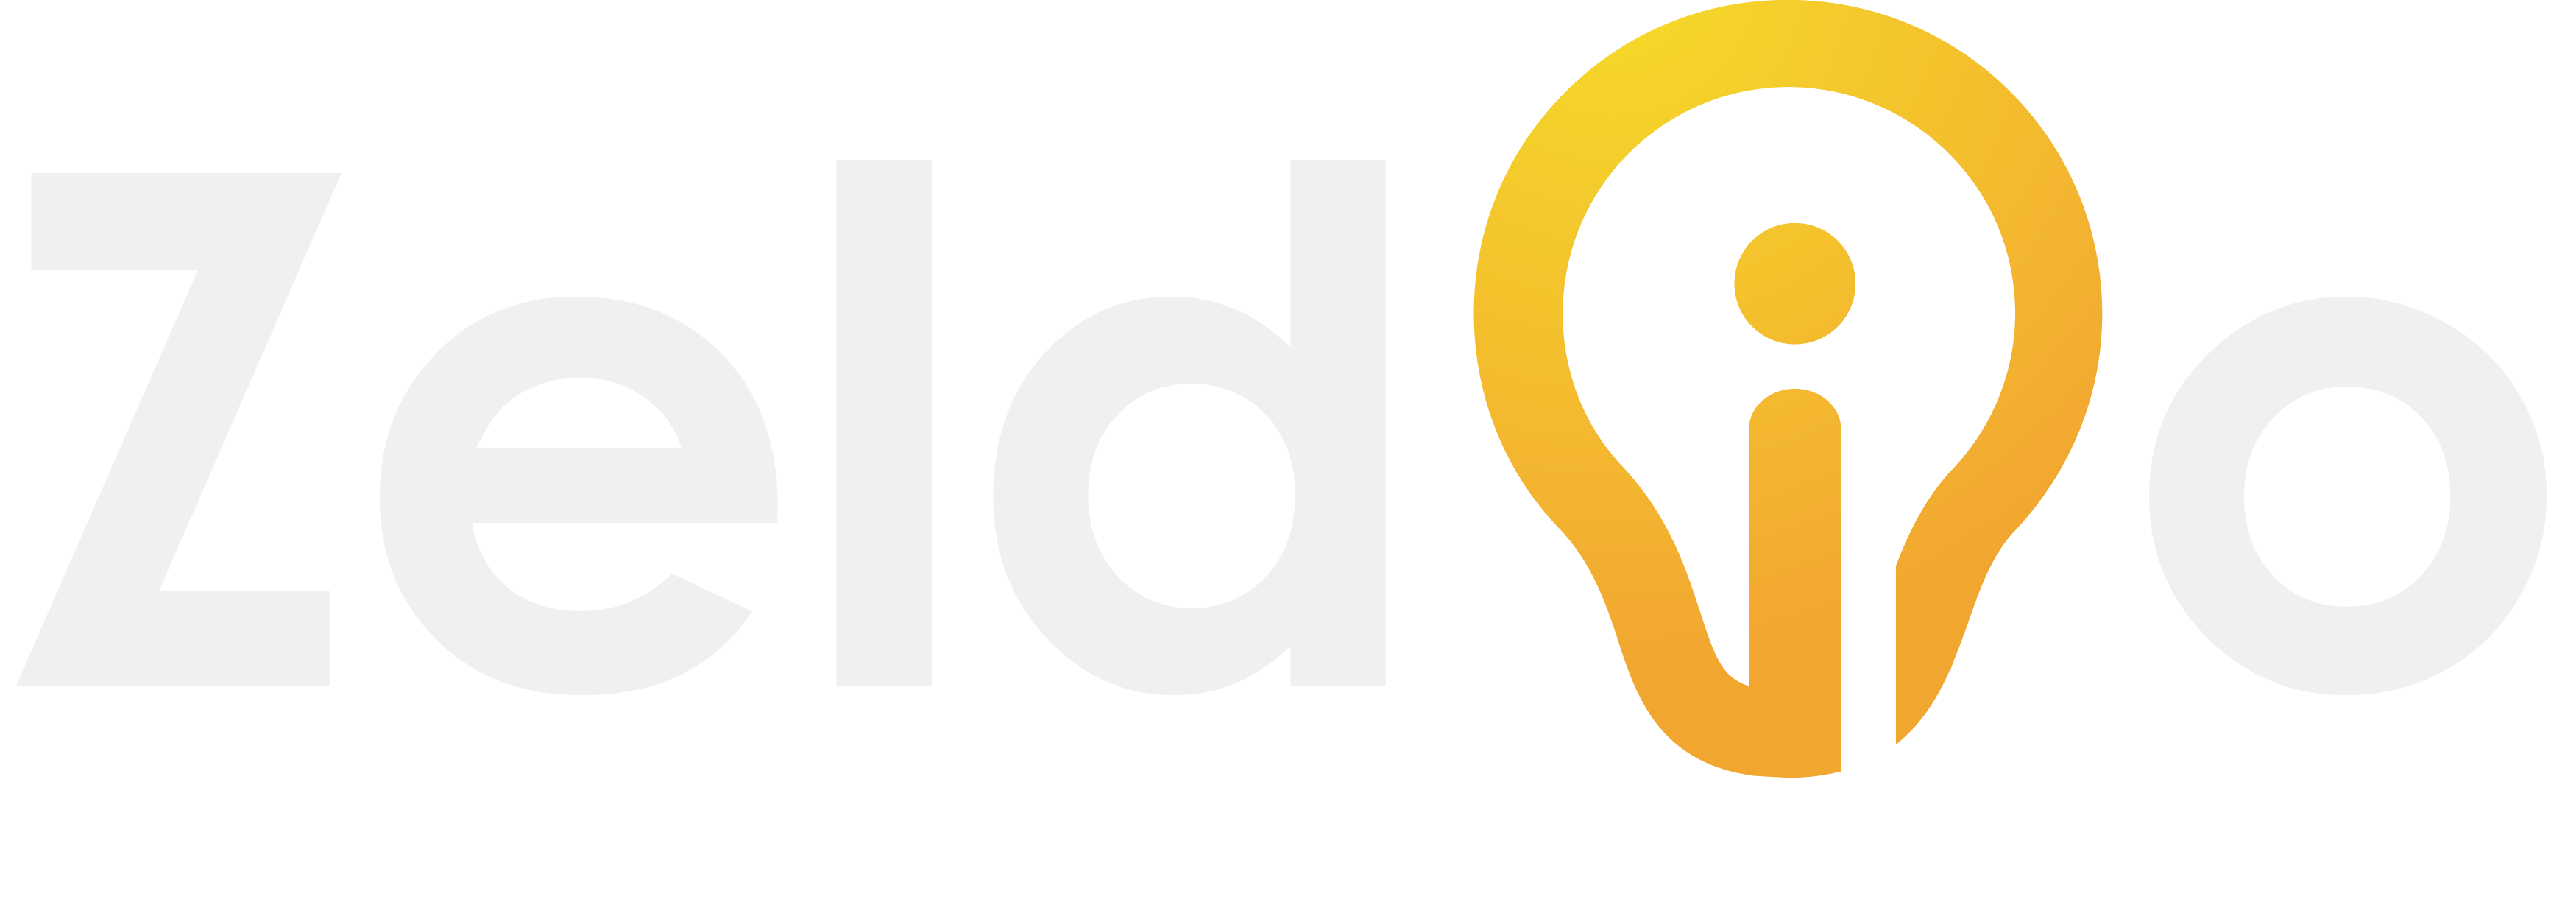 Zeldio - Logga ljus